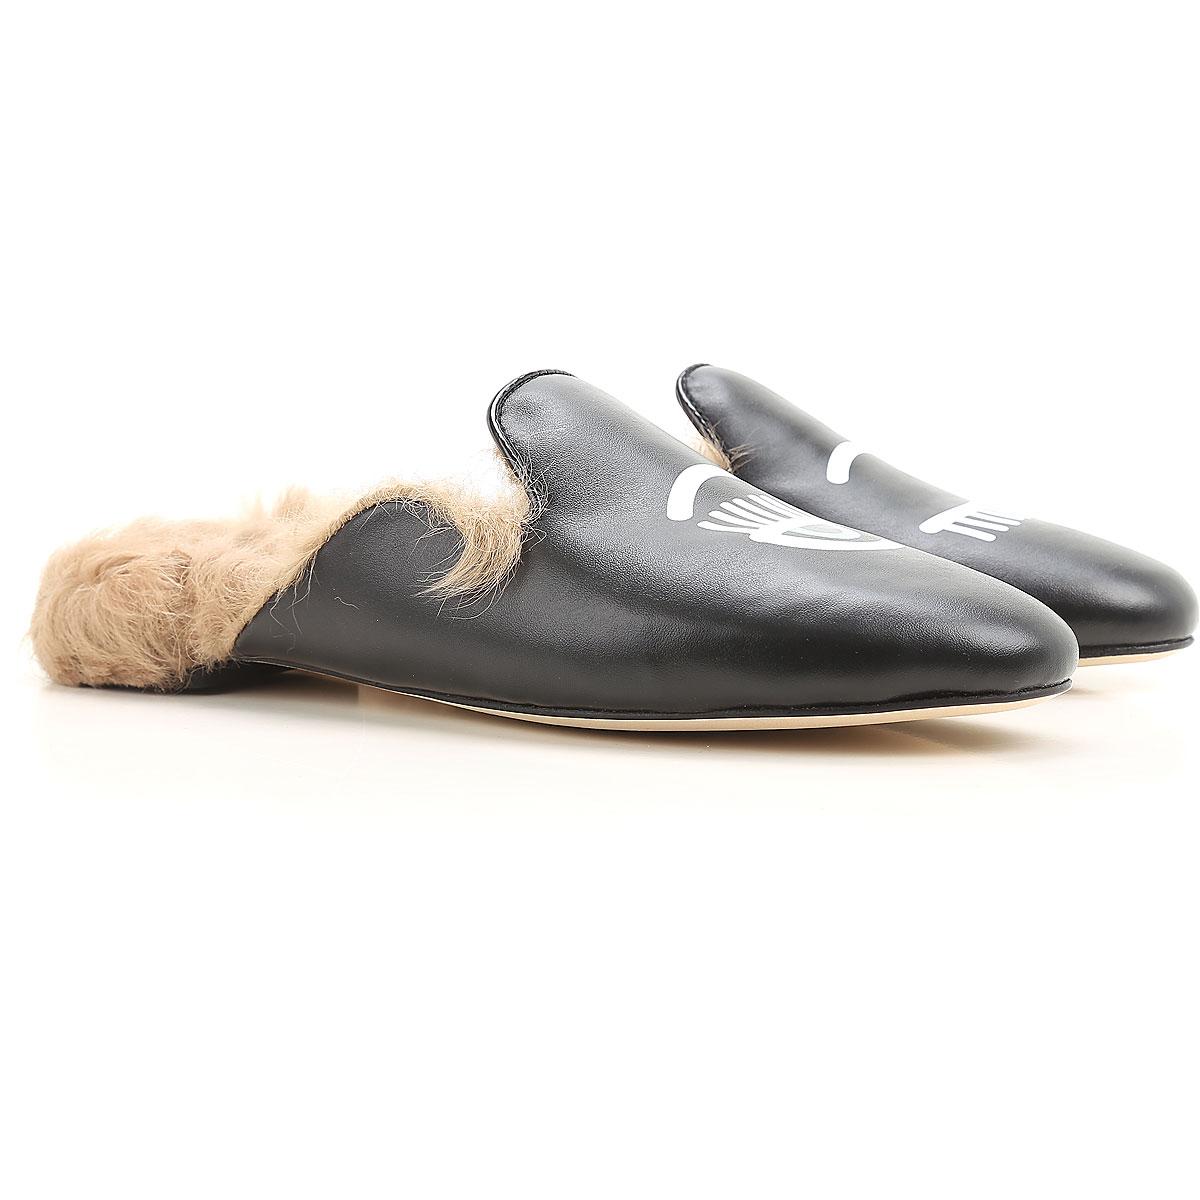 Chiara Ferragni Sandals for Women On Sale in Outlet, Black, Leather, 2019, 5 6 7